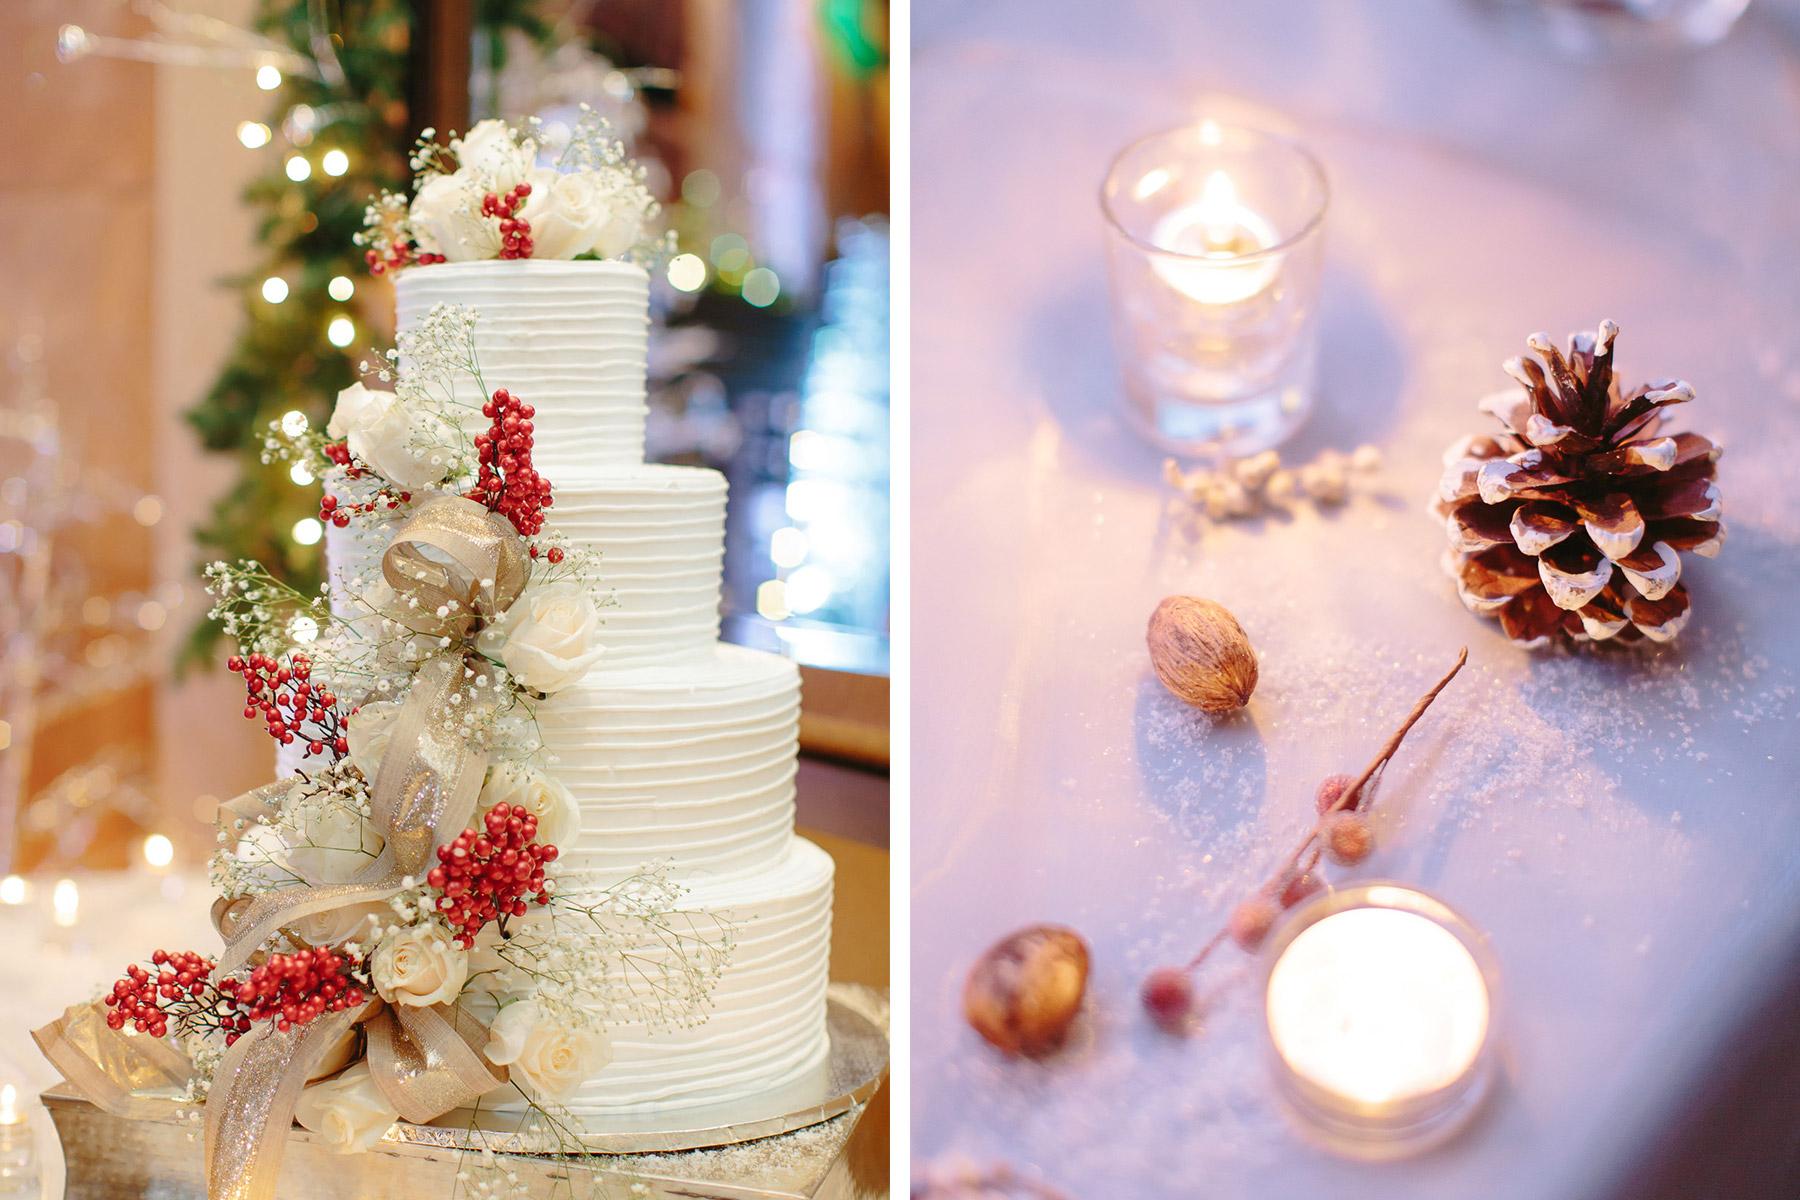 161210-Luxium-Weddings-Arizona-Matt-Jenny-Anthem-Golf-Country-Club-1074a.jpg